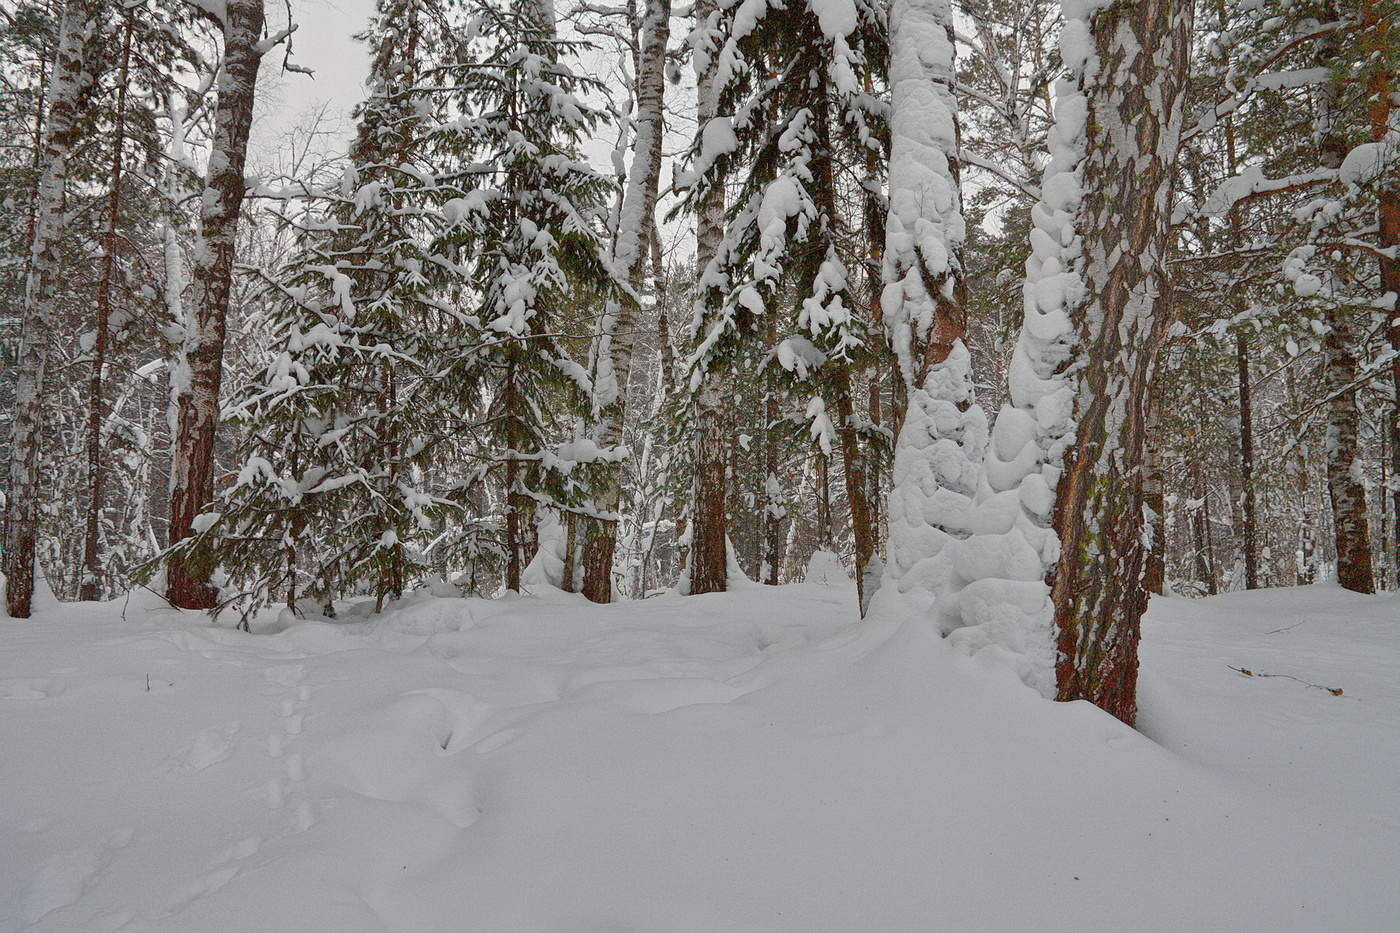 лезут вперед зимний лес луза фото народных методов